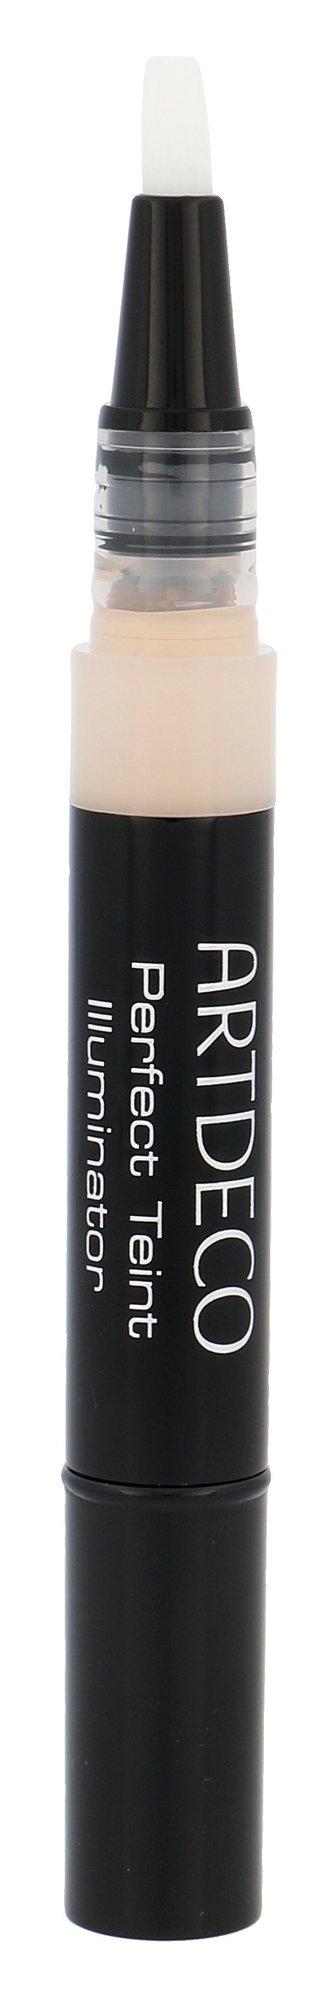 Artdeco Perfect Teint Cosmetic 2ml 8 Illuminating Yellow